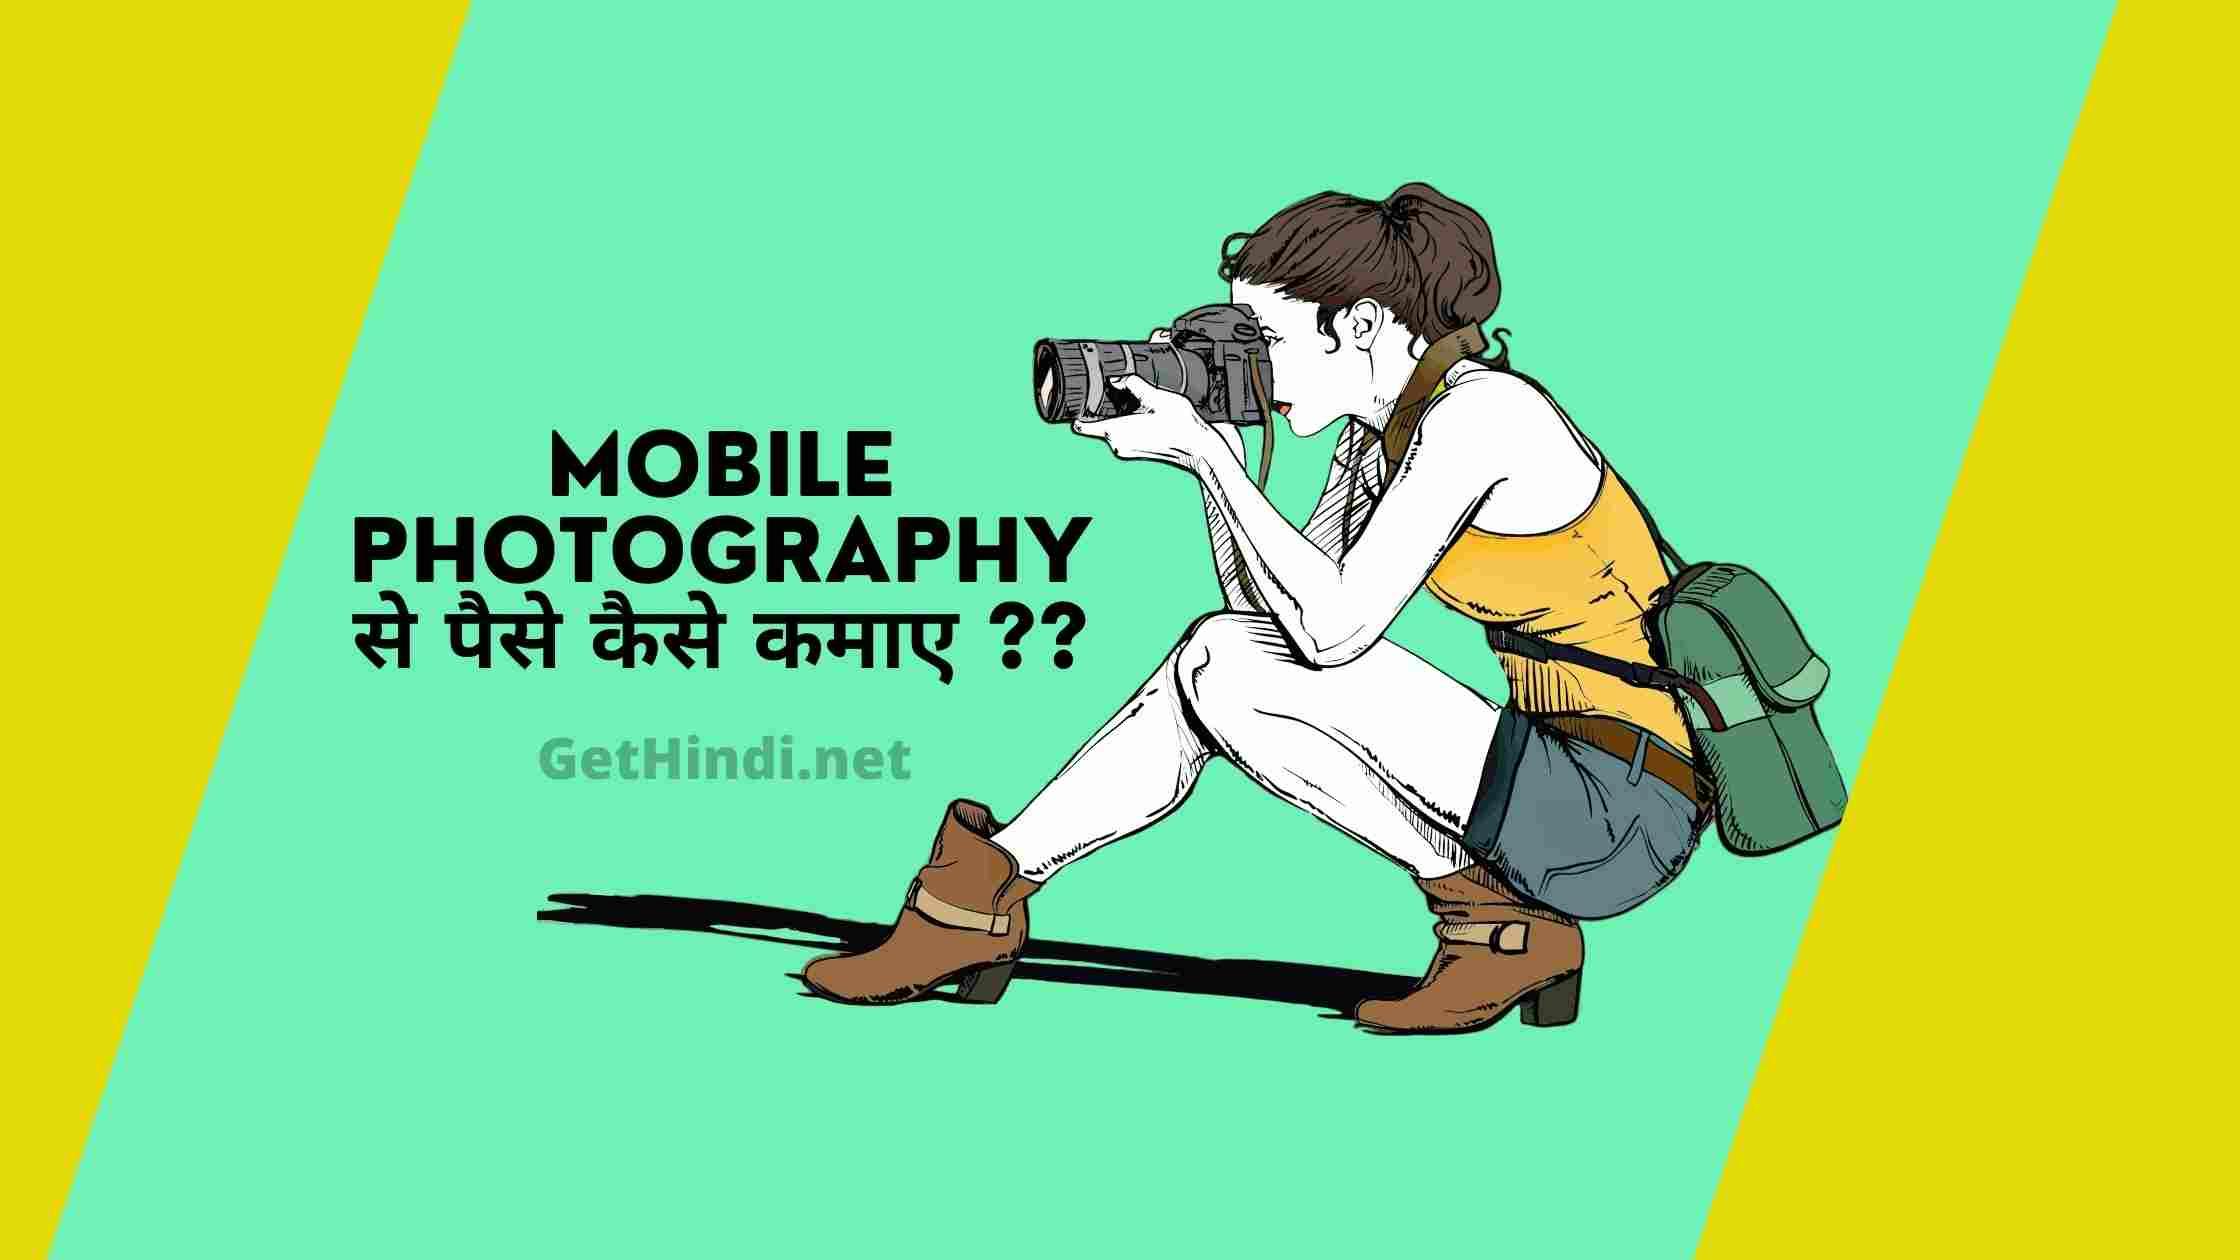 Mobile photography se paise kaise kamaye ??